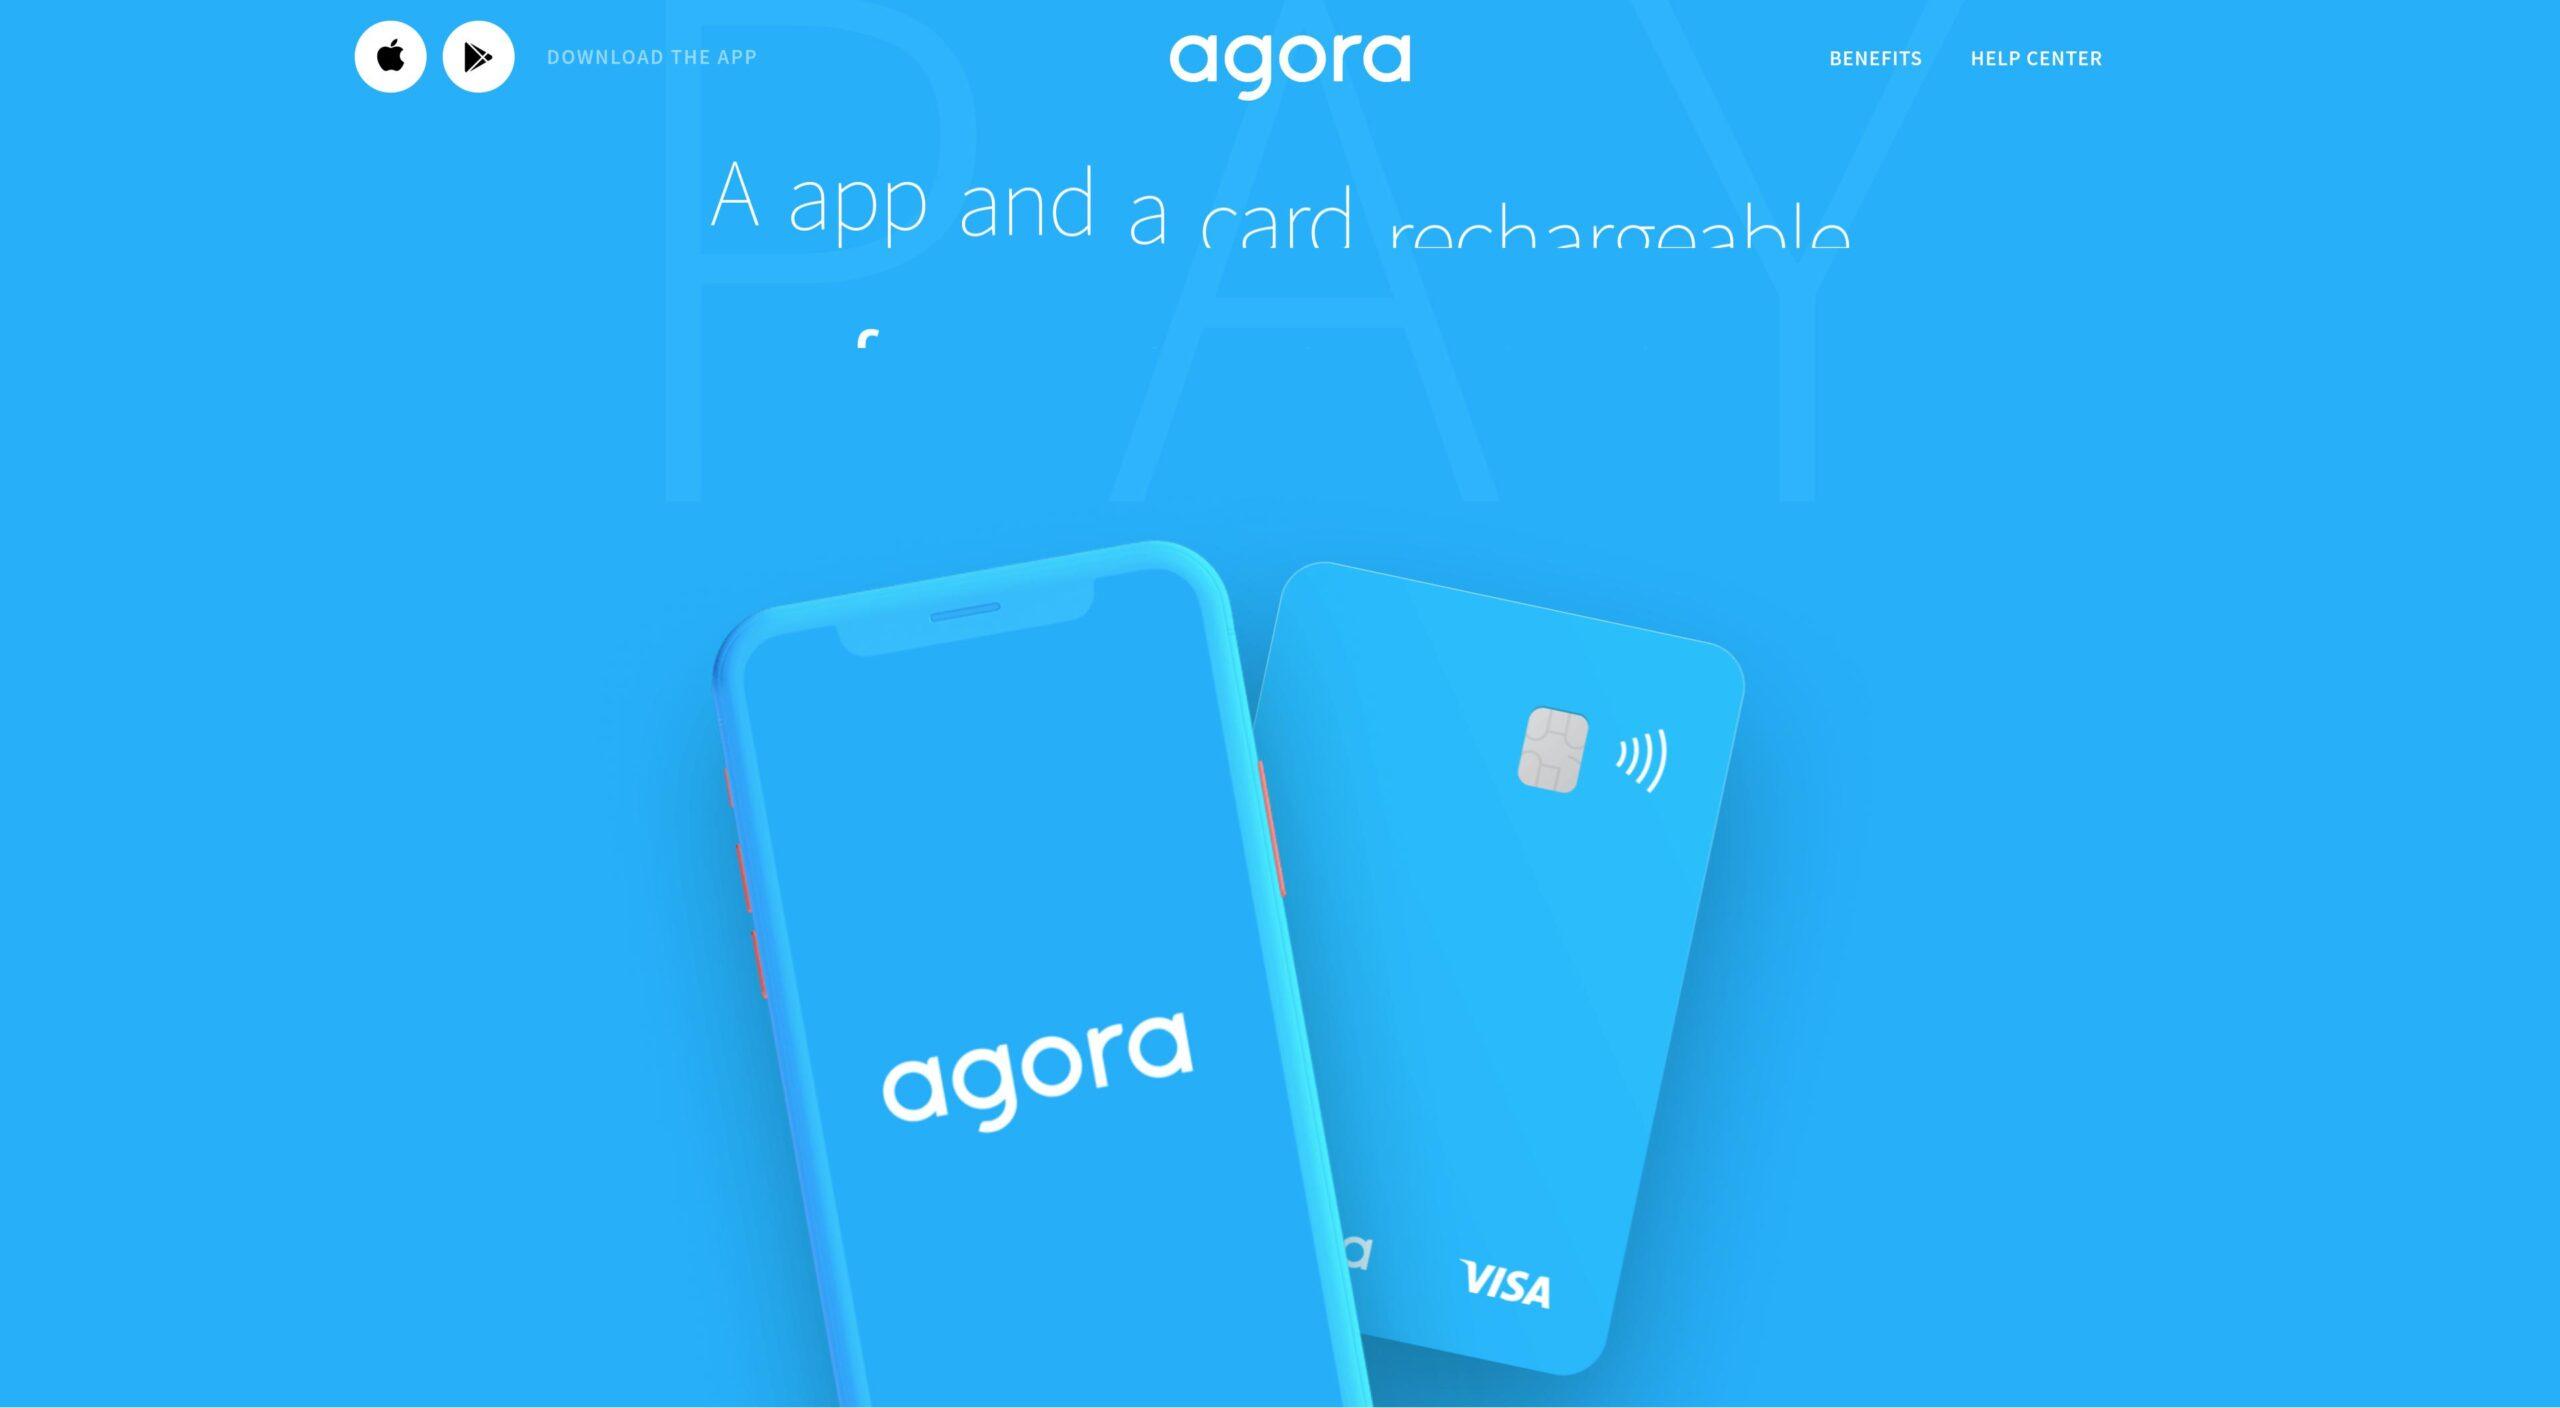 Orpetron Web Design Awards - Agora - Web Design Awards Inspiration Trends UI UX